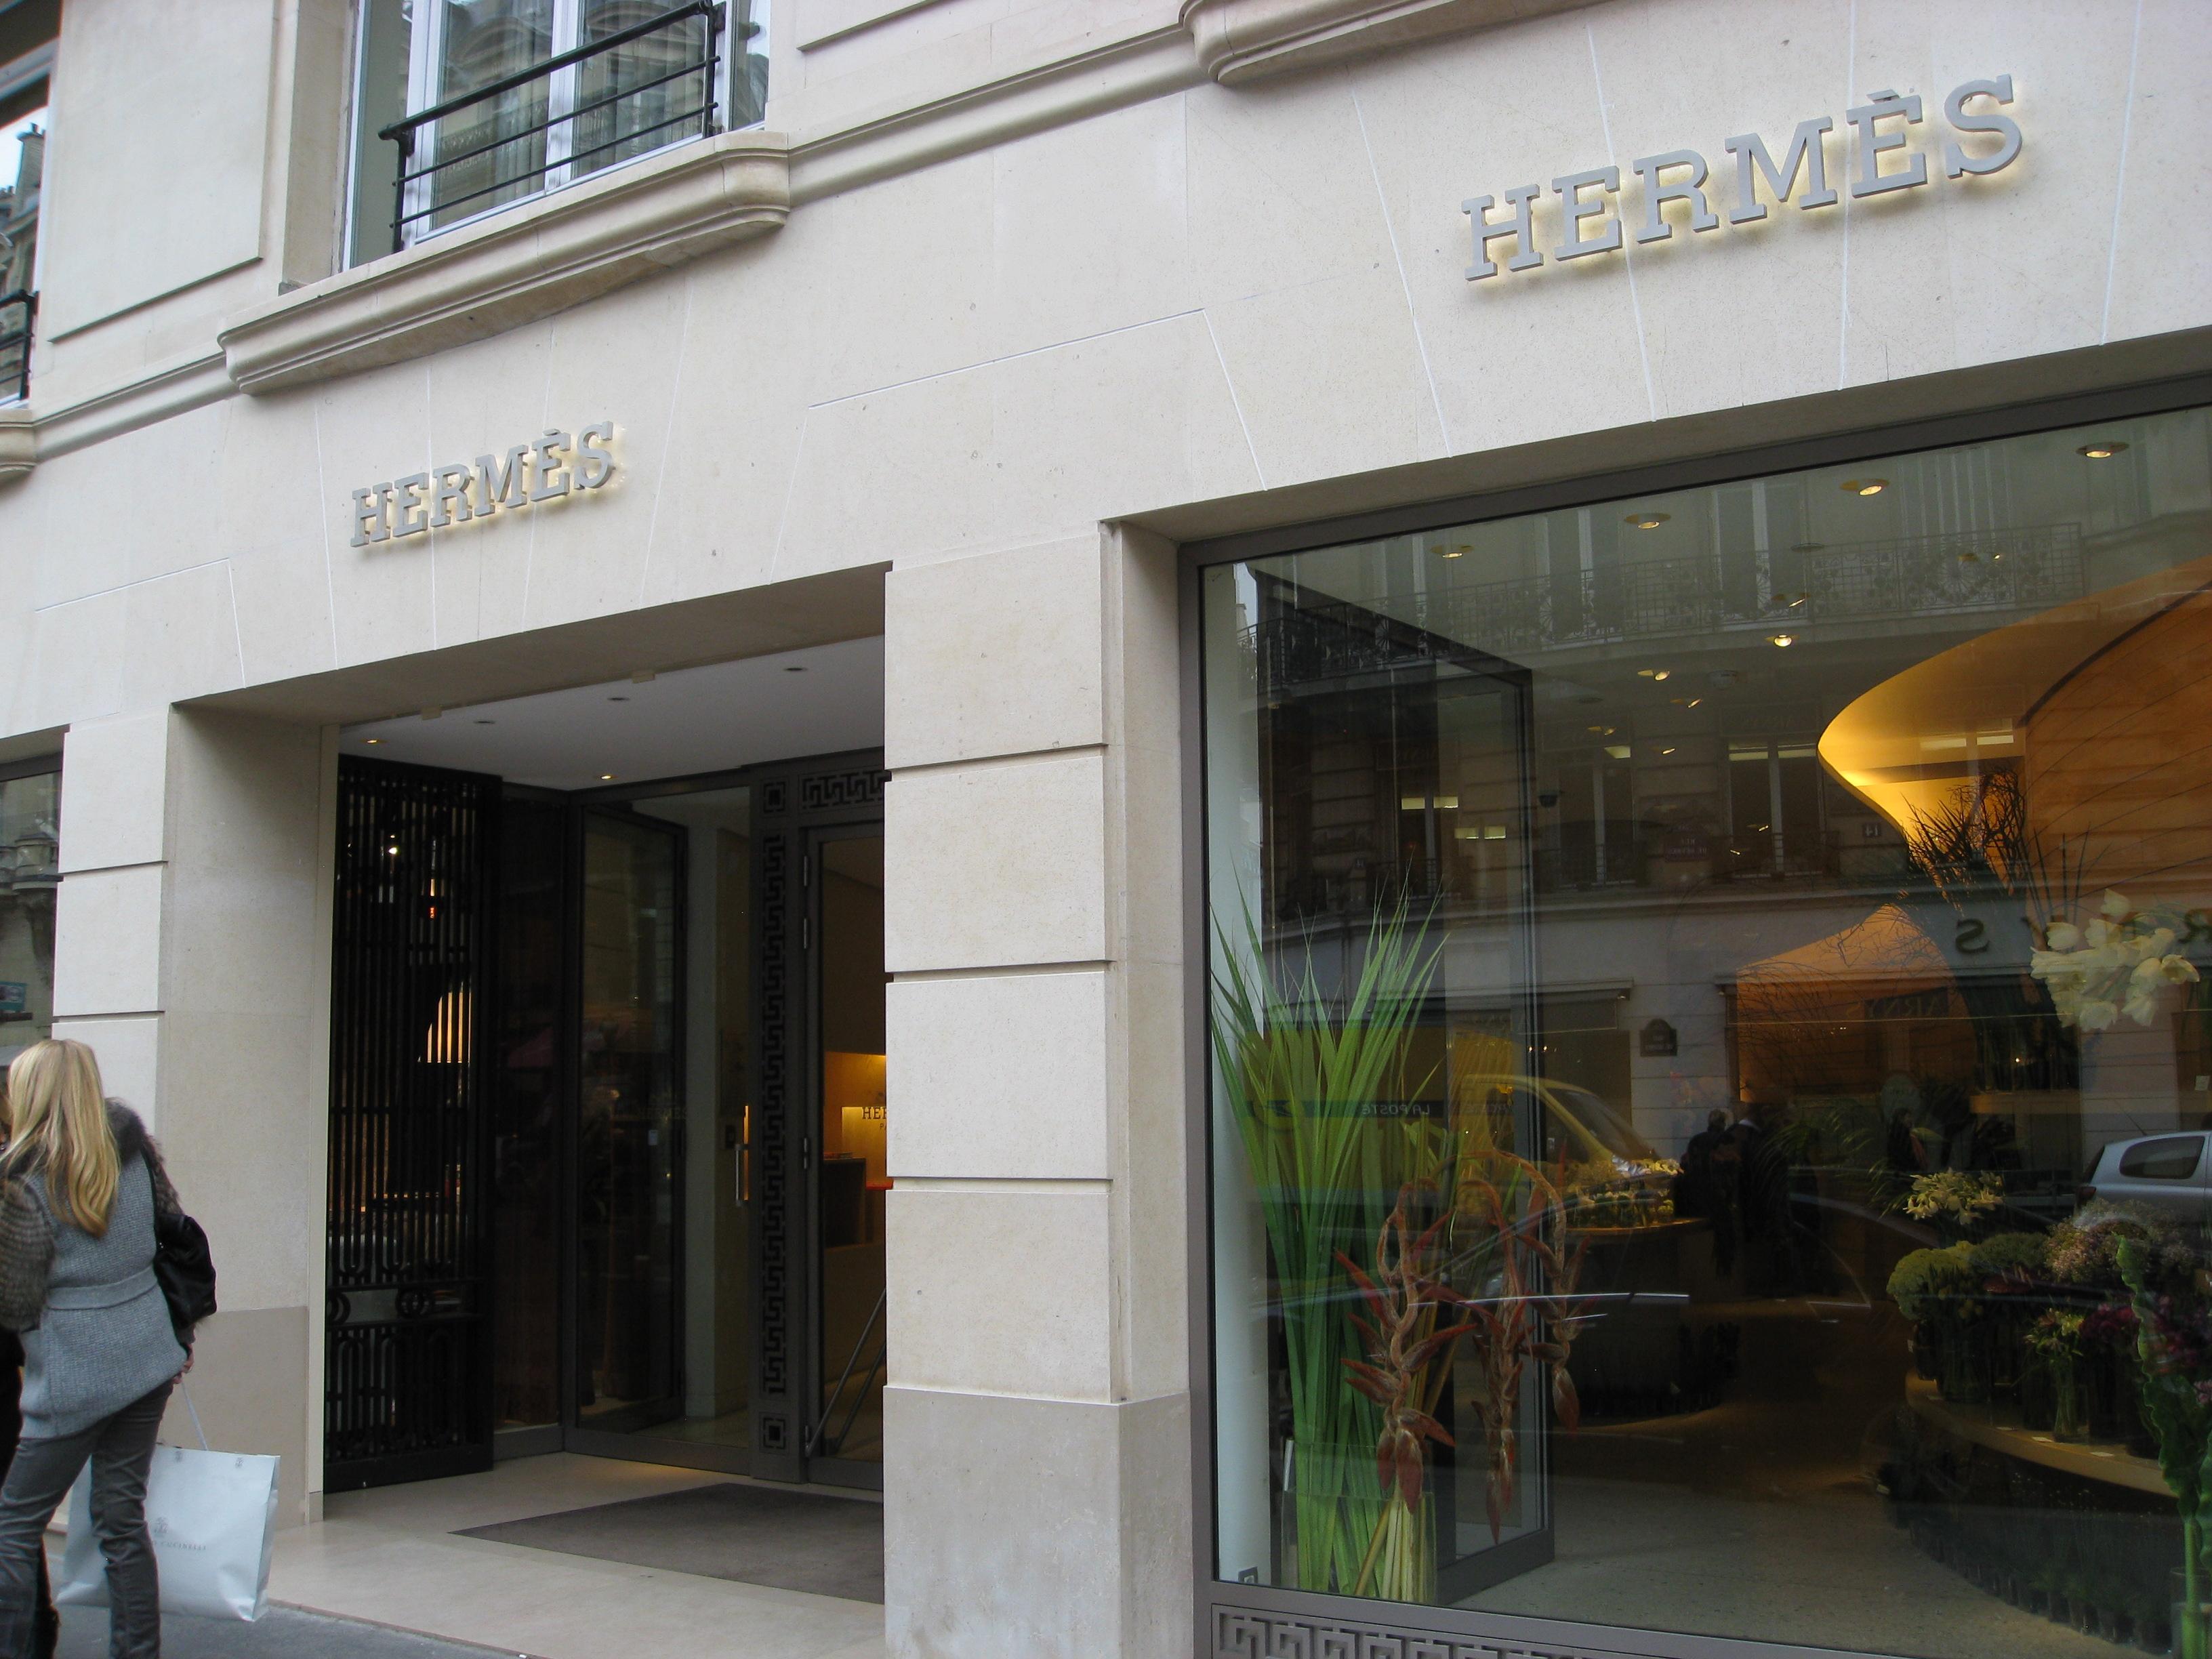 Hermes' New Store in Paris